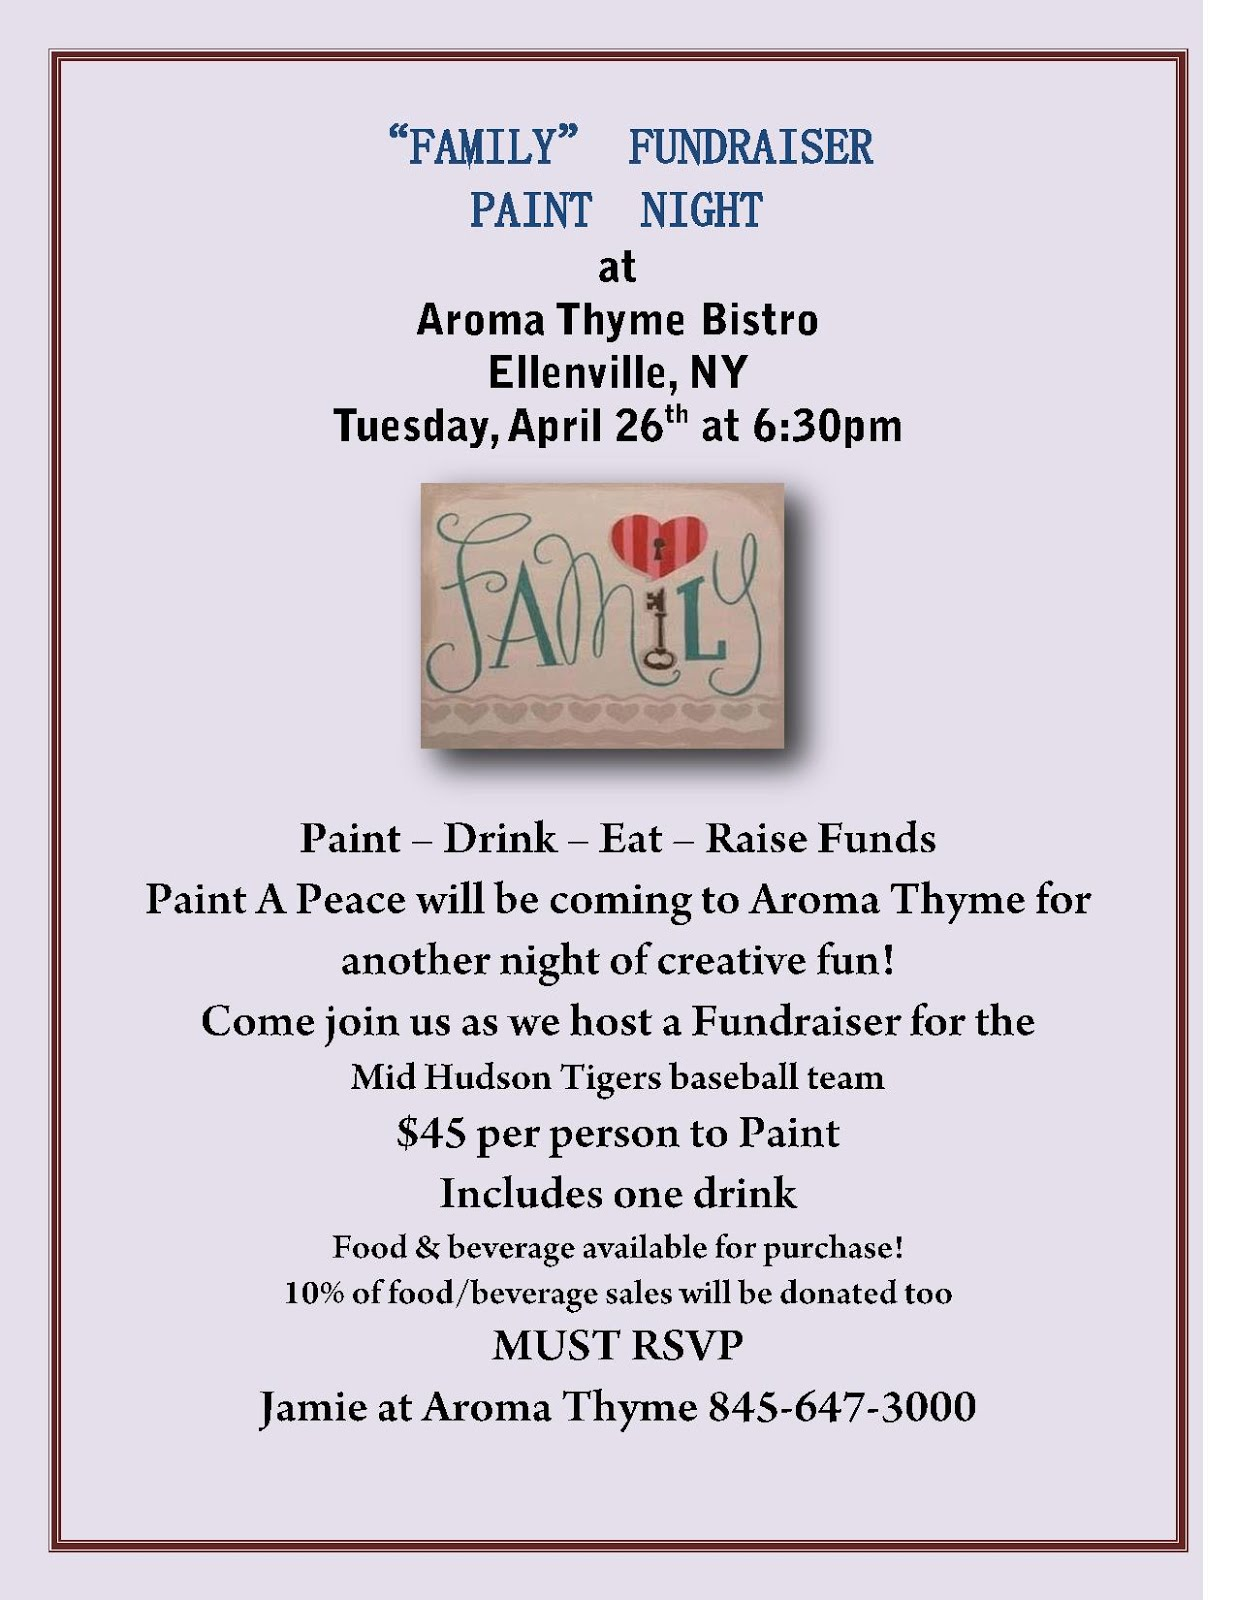 Family Fundraiser Paint Night